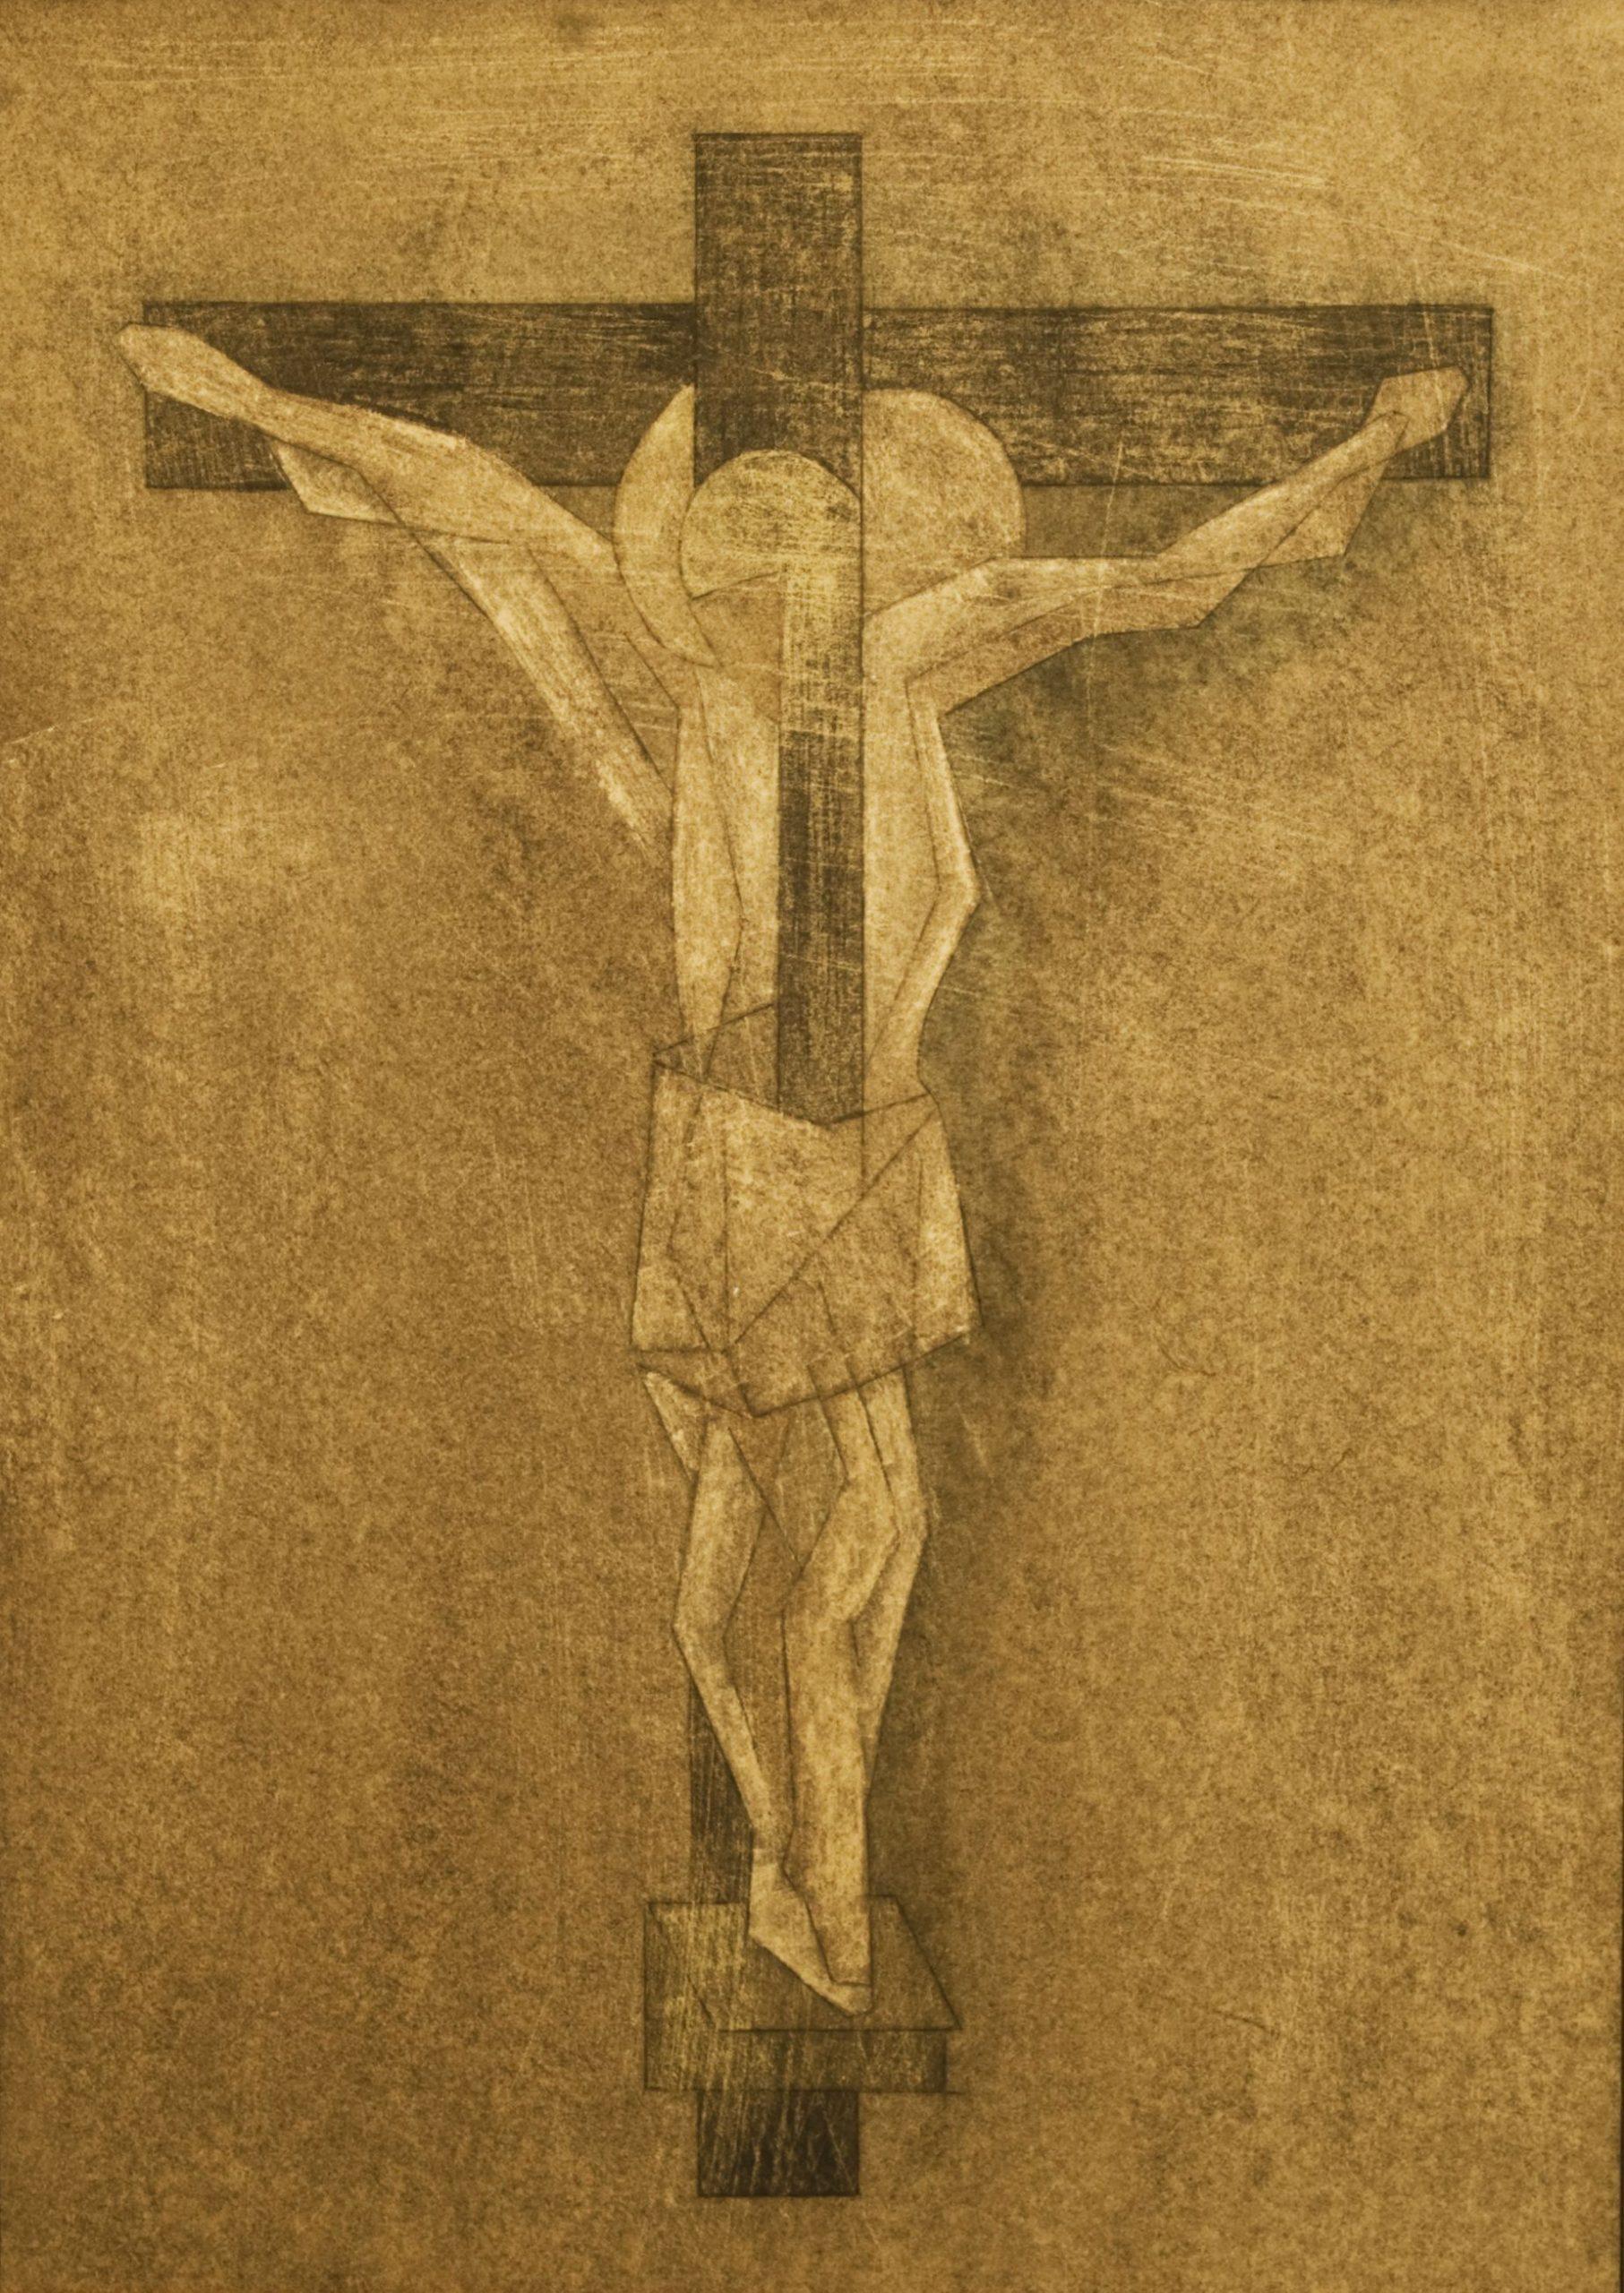 1930, Crucifijo de Herman Trunk